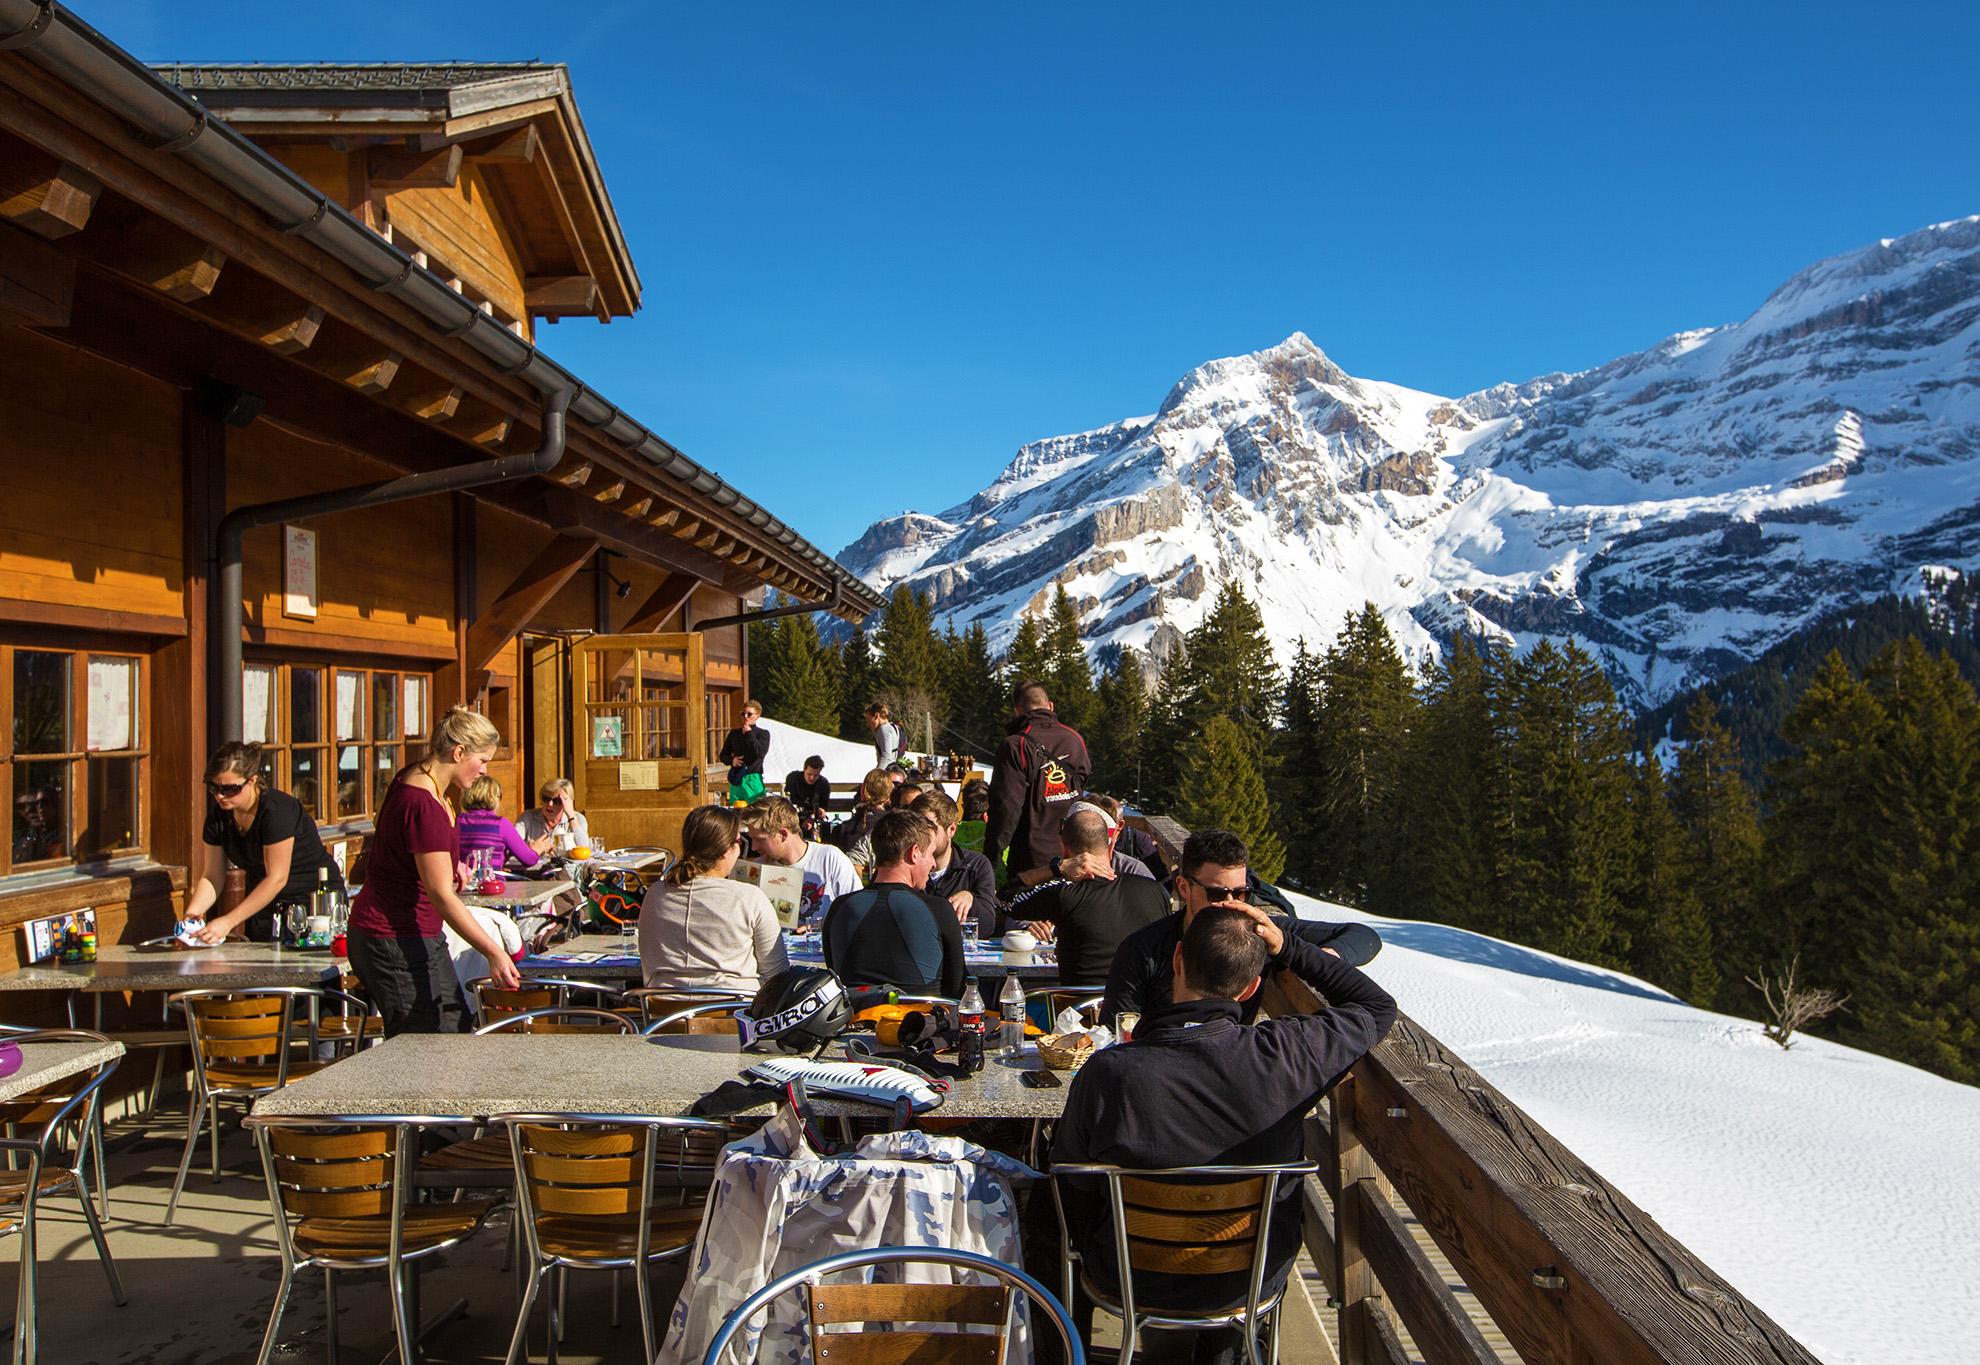 kt_2020_320_Keytours_excursions_Swisstours_glacier3000_village3_2048_10